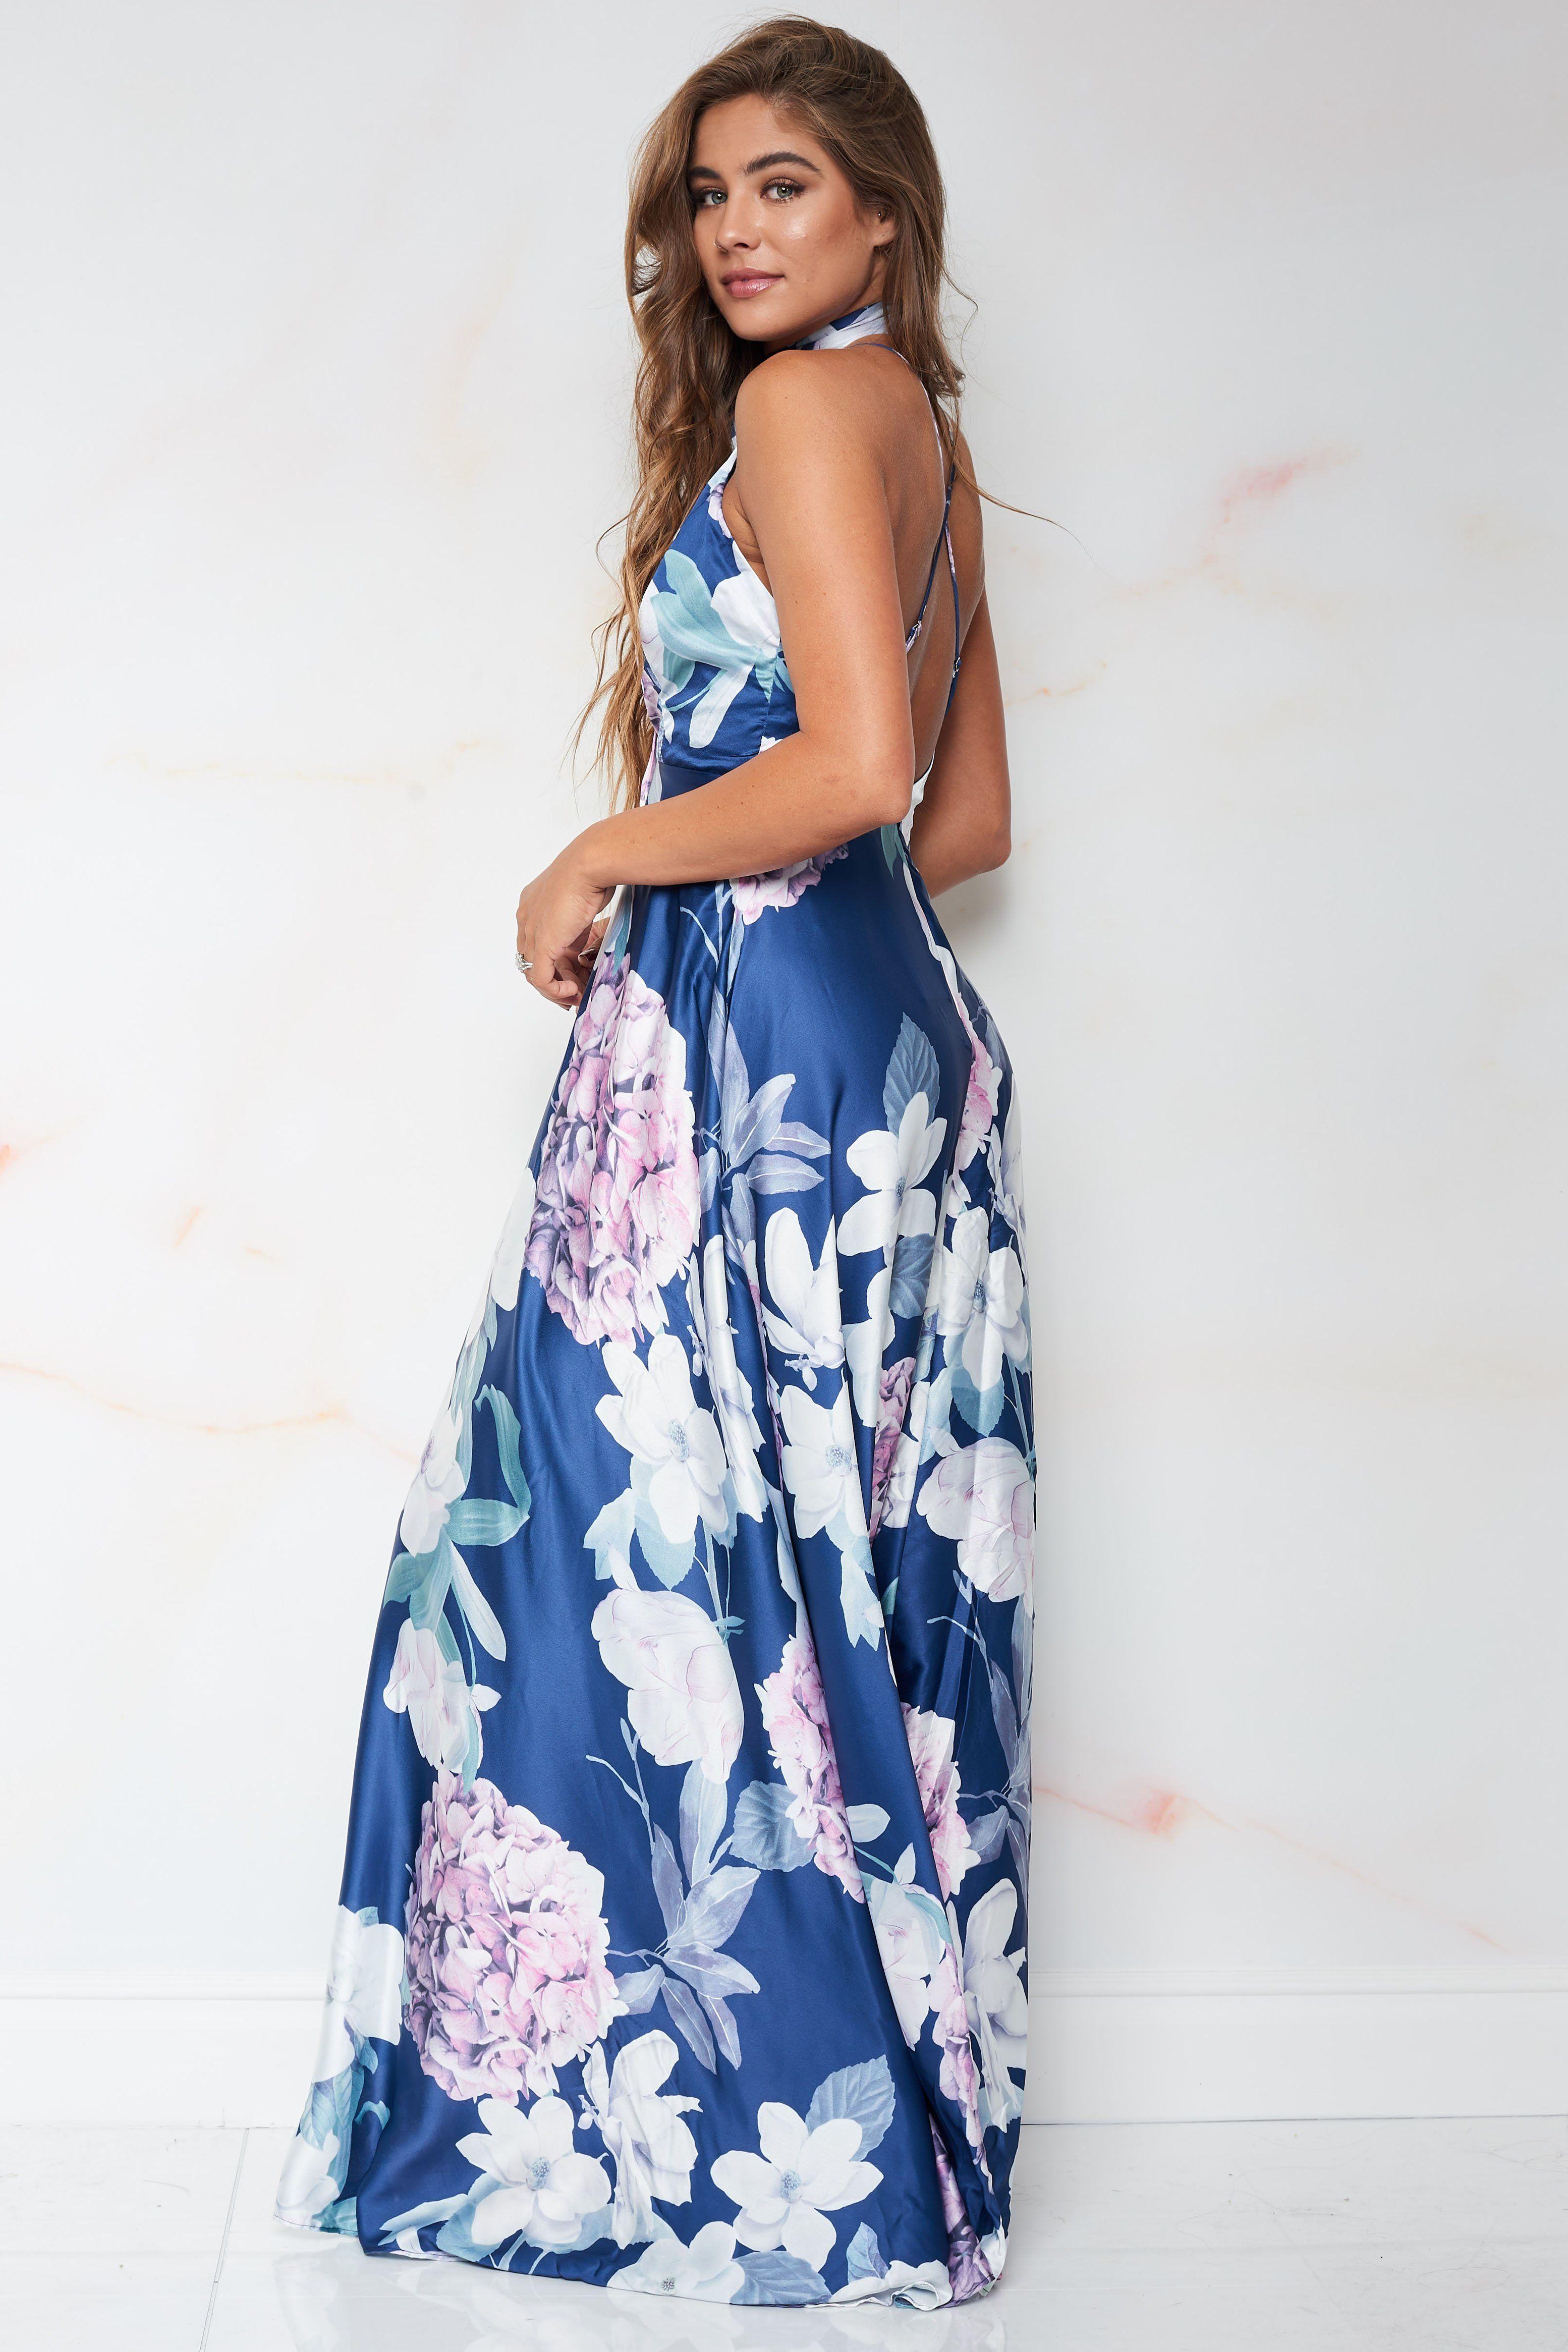 70ce8e90c22 A satin maxi dress featuring a beautiful floral print